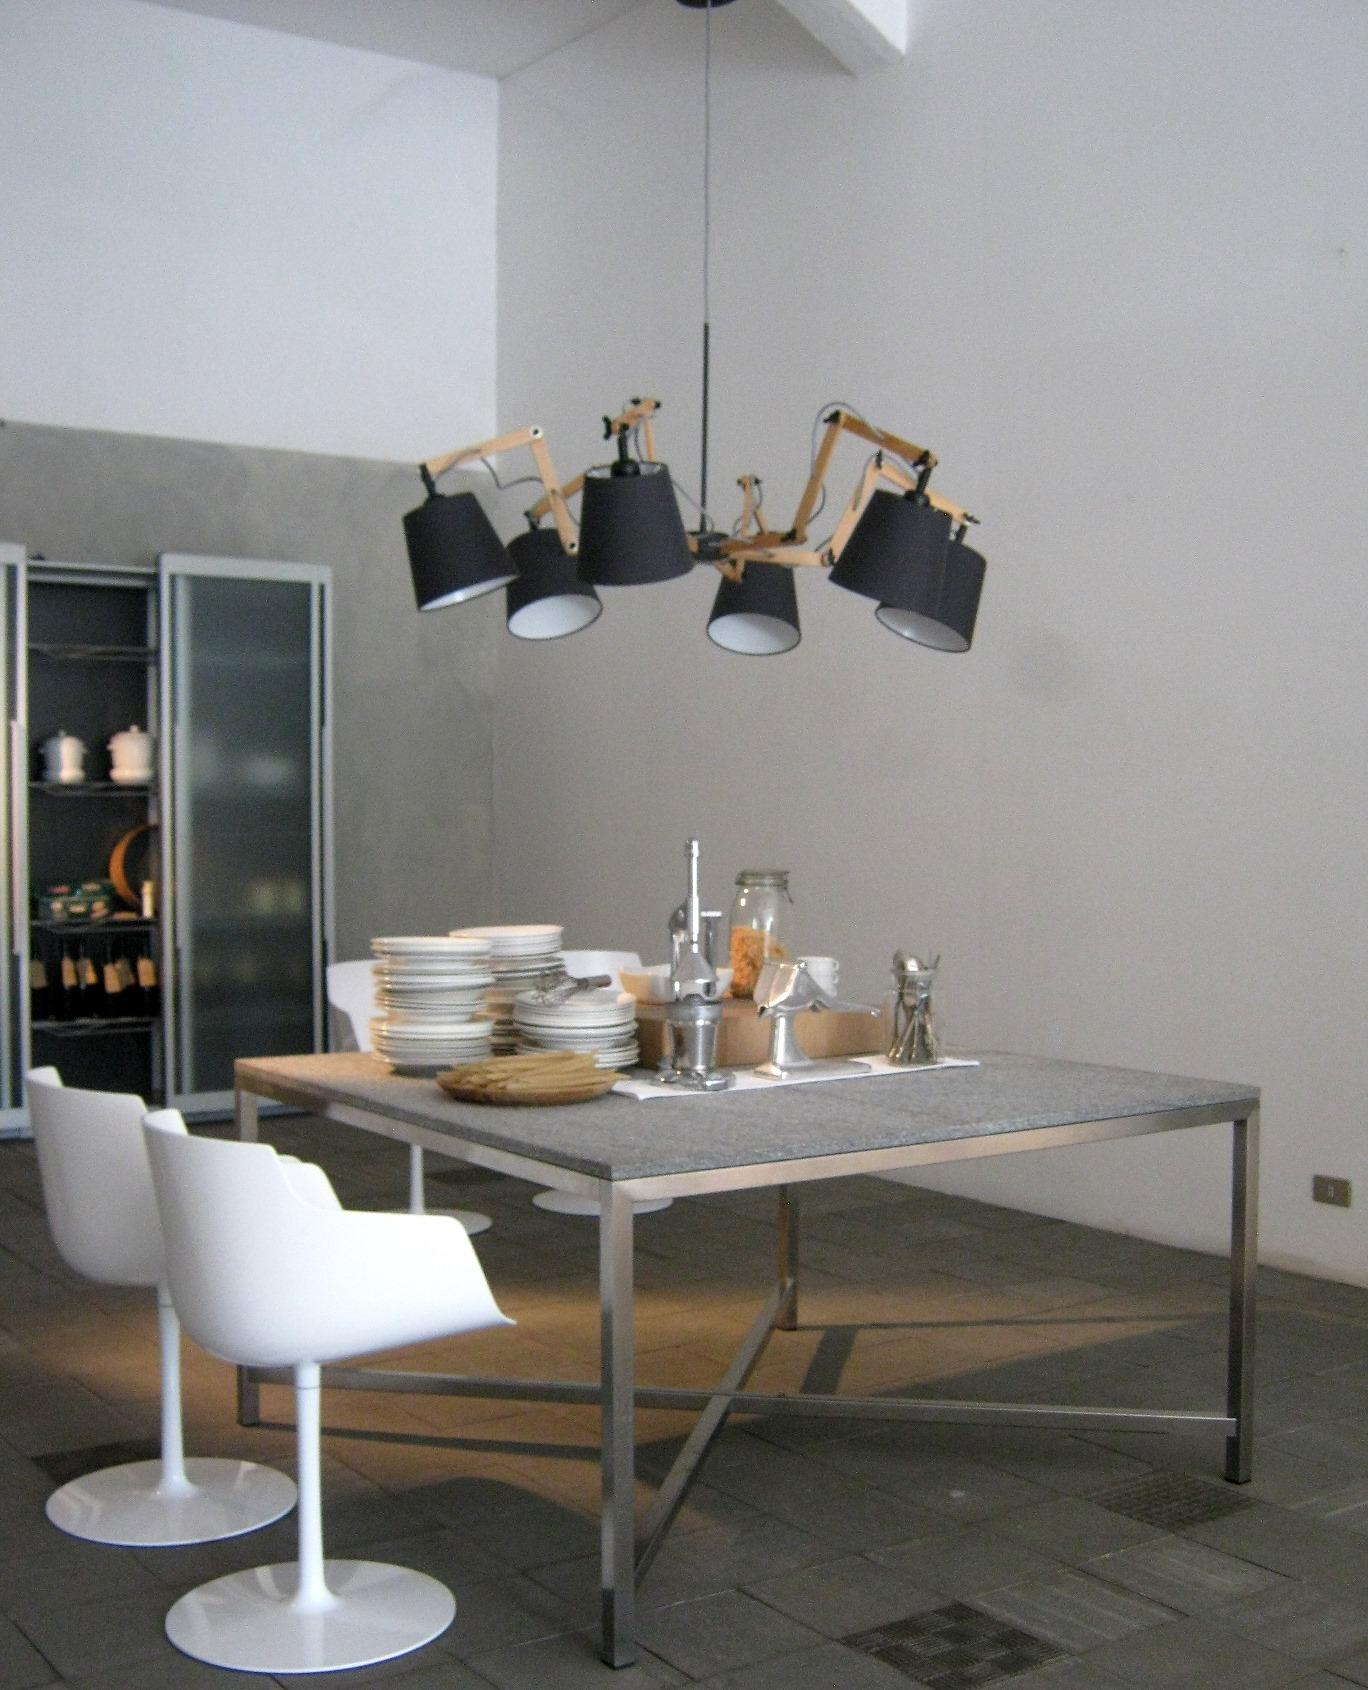 Flos Illuminazione Lampada a sospensione design , vendita online - Illuminazi...